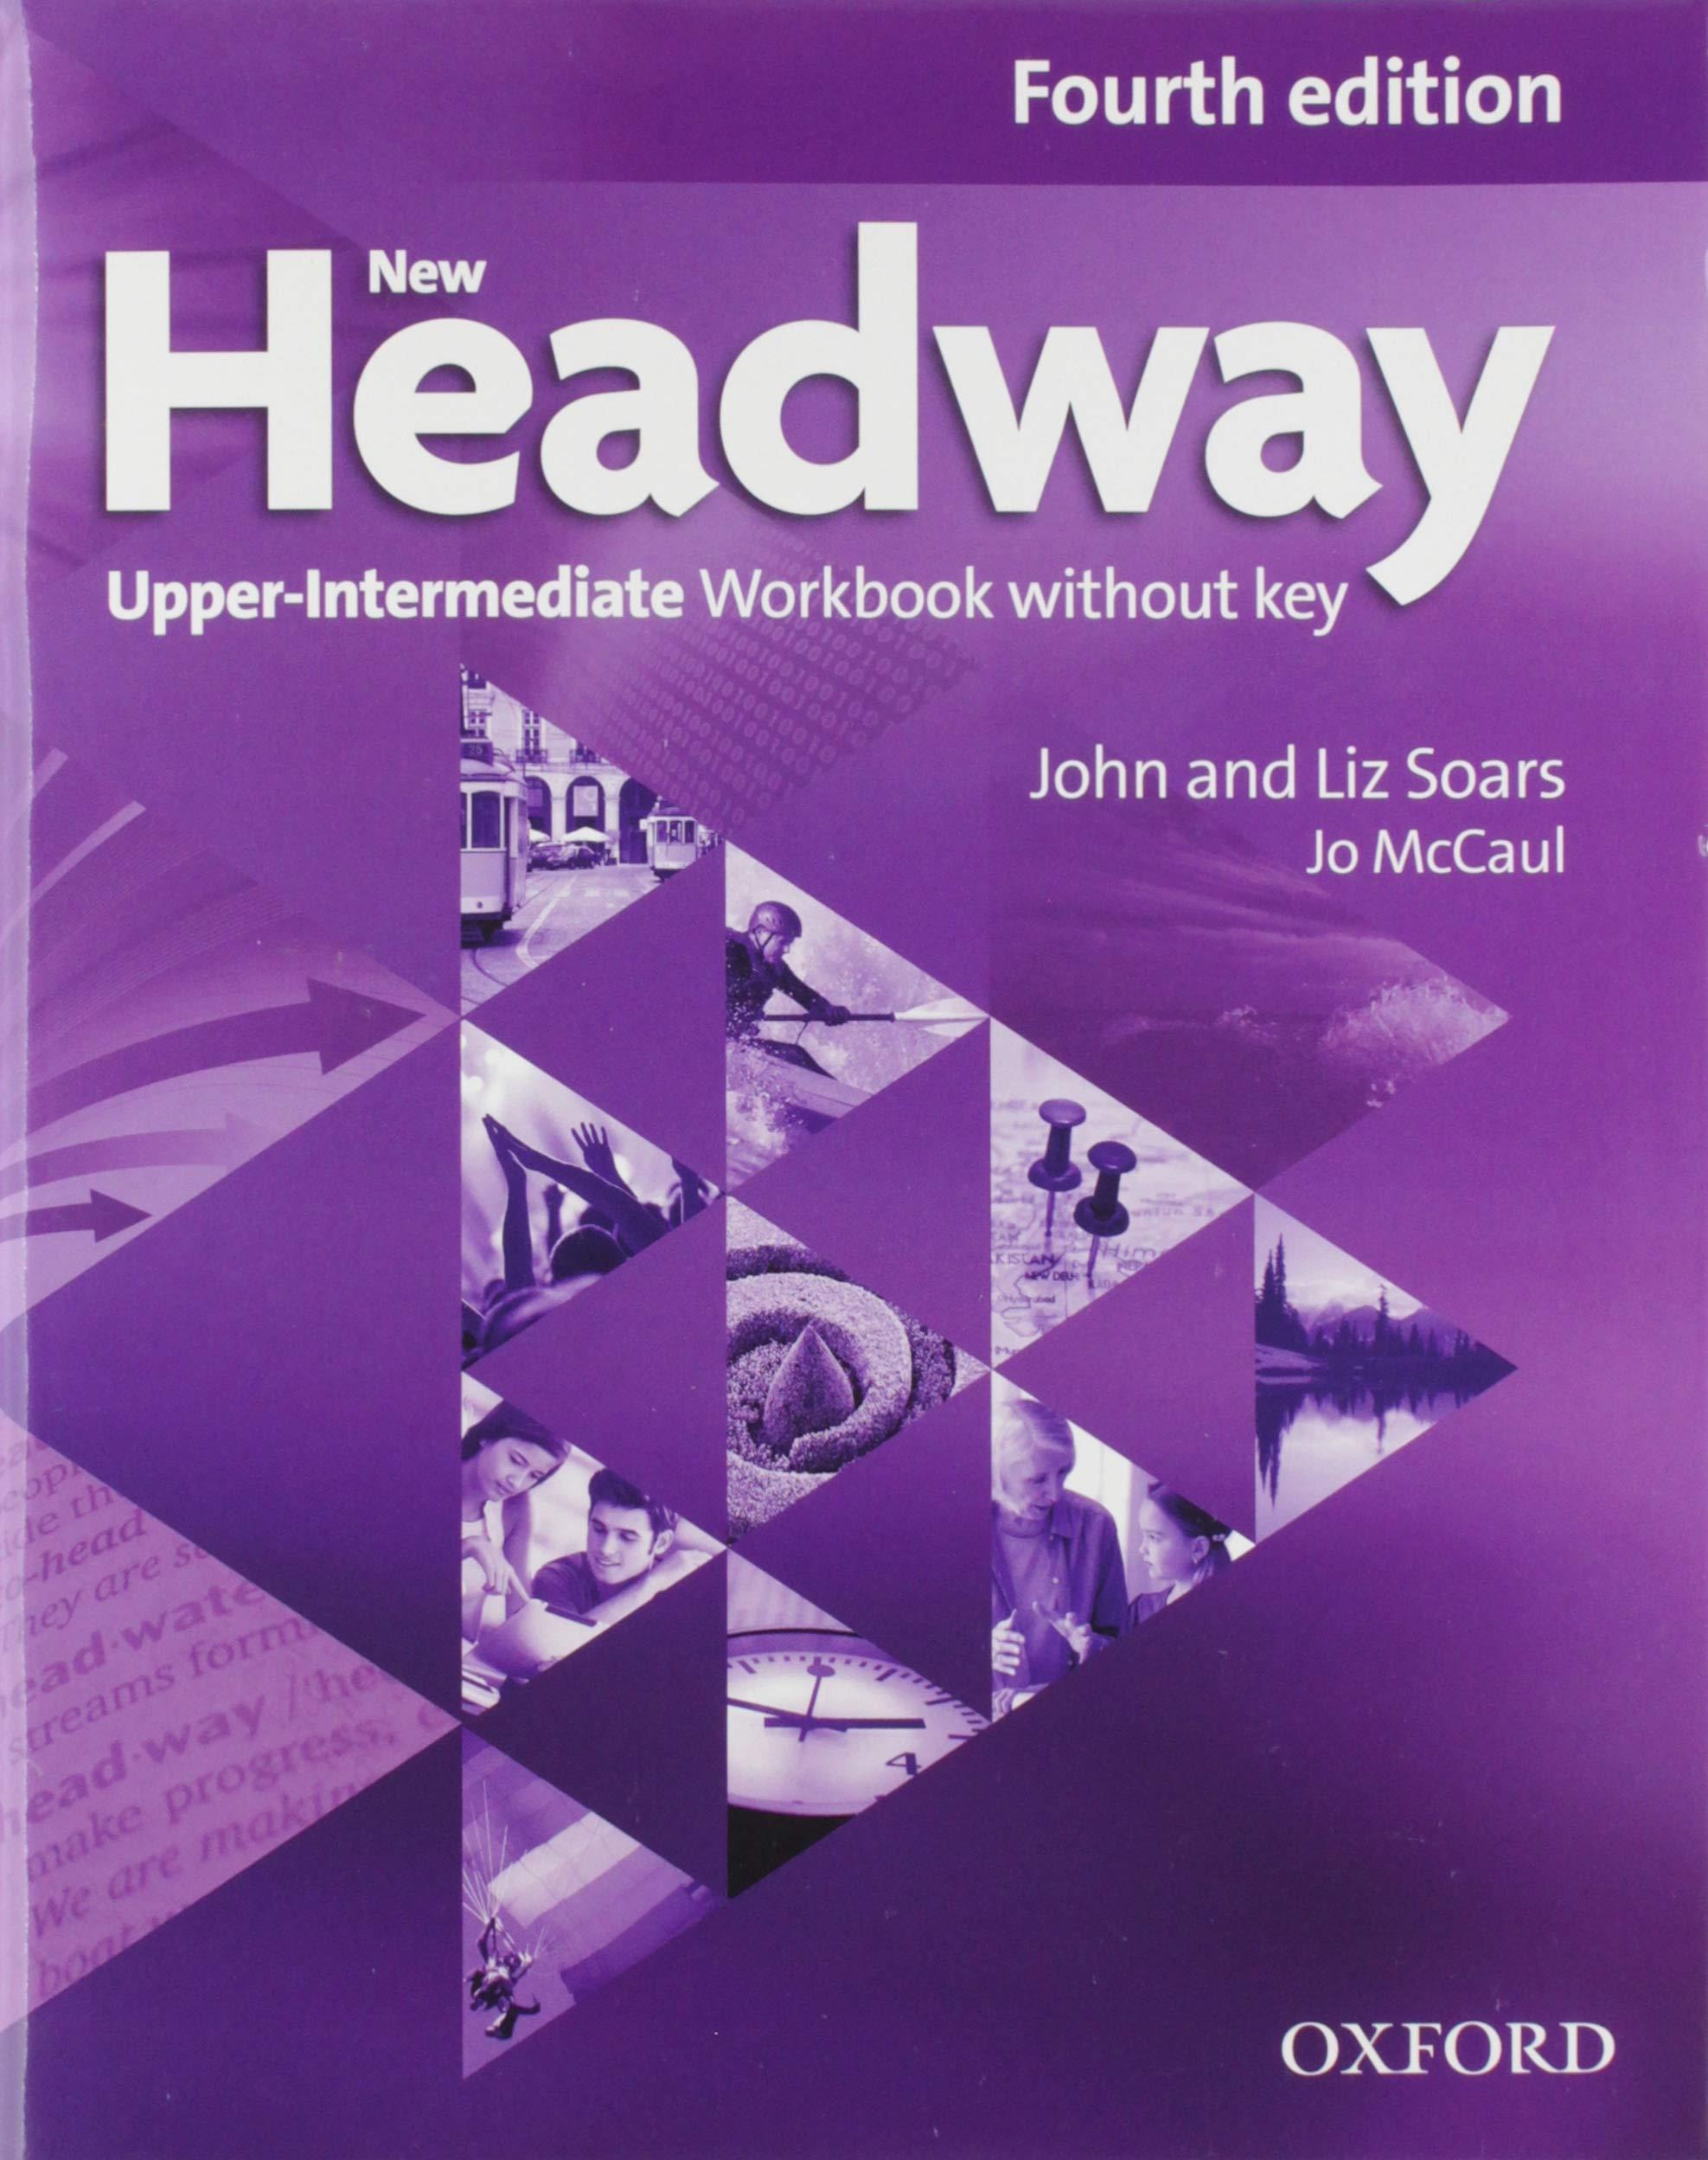 NEW HEADWAY UPPER-INTERMEDIATE WB (+ iCHECKER) 4TH ED